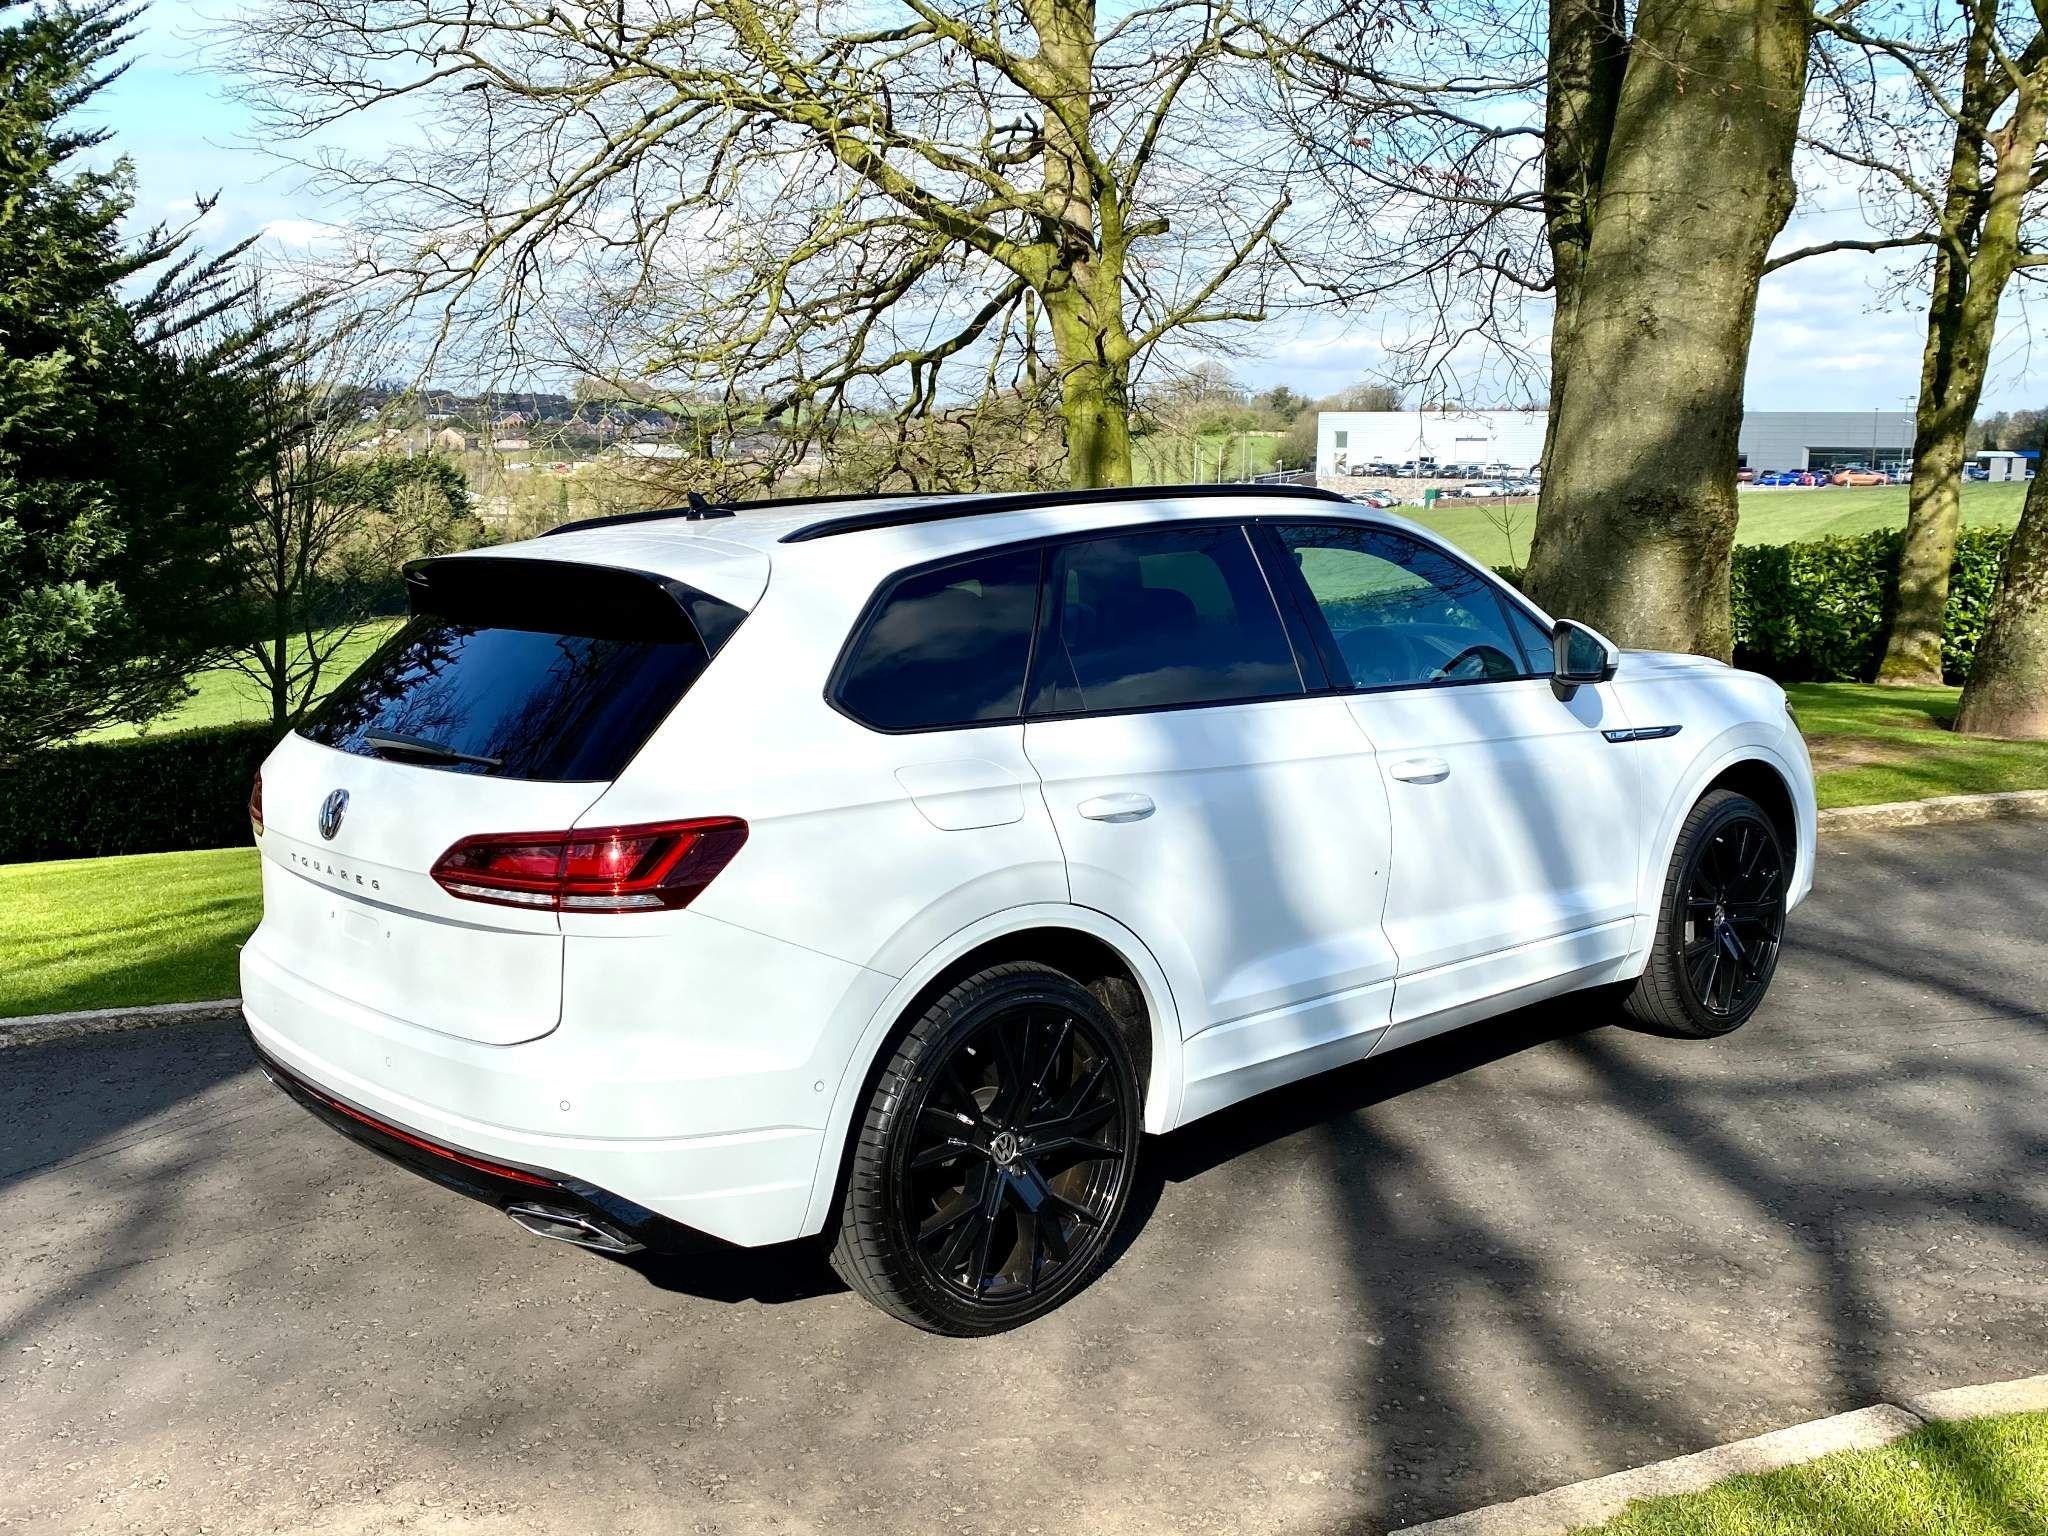 2019 Volkswagen Touareg 3.0 TDI V6 R-Line Tiptronic 4WD (s/s) 5dr Diesel Automatic – Moyway Motors Dungannon full